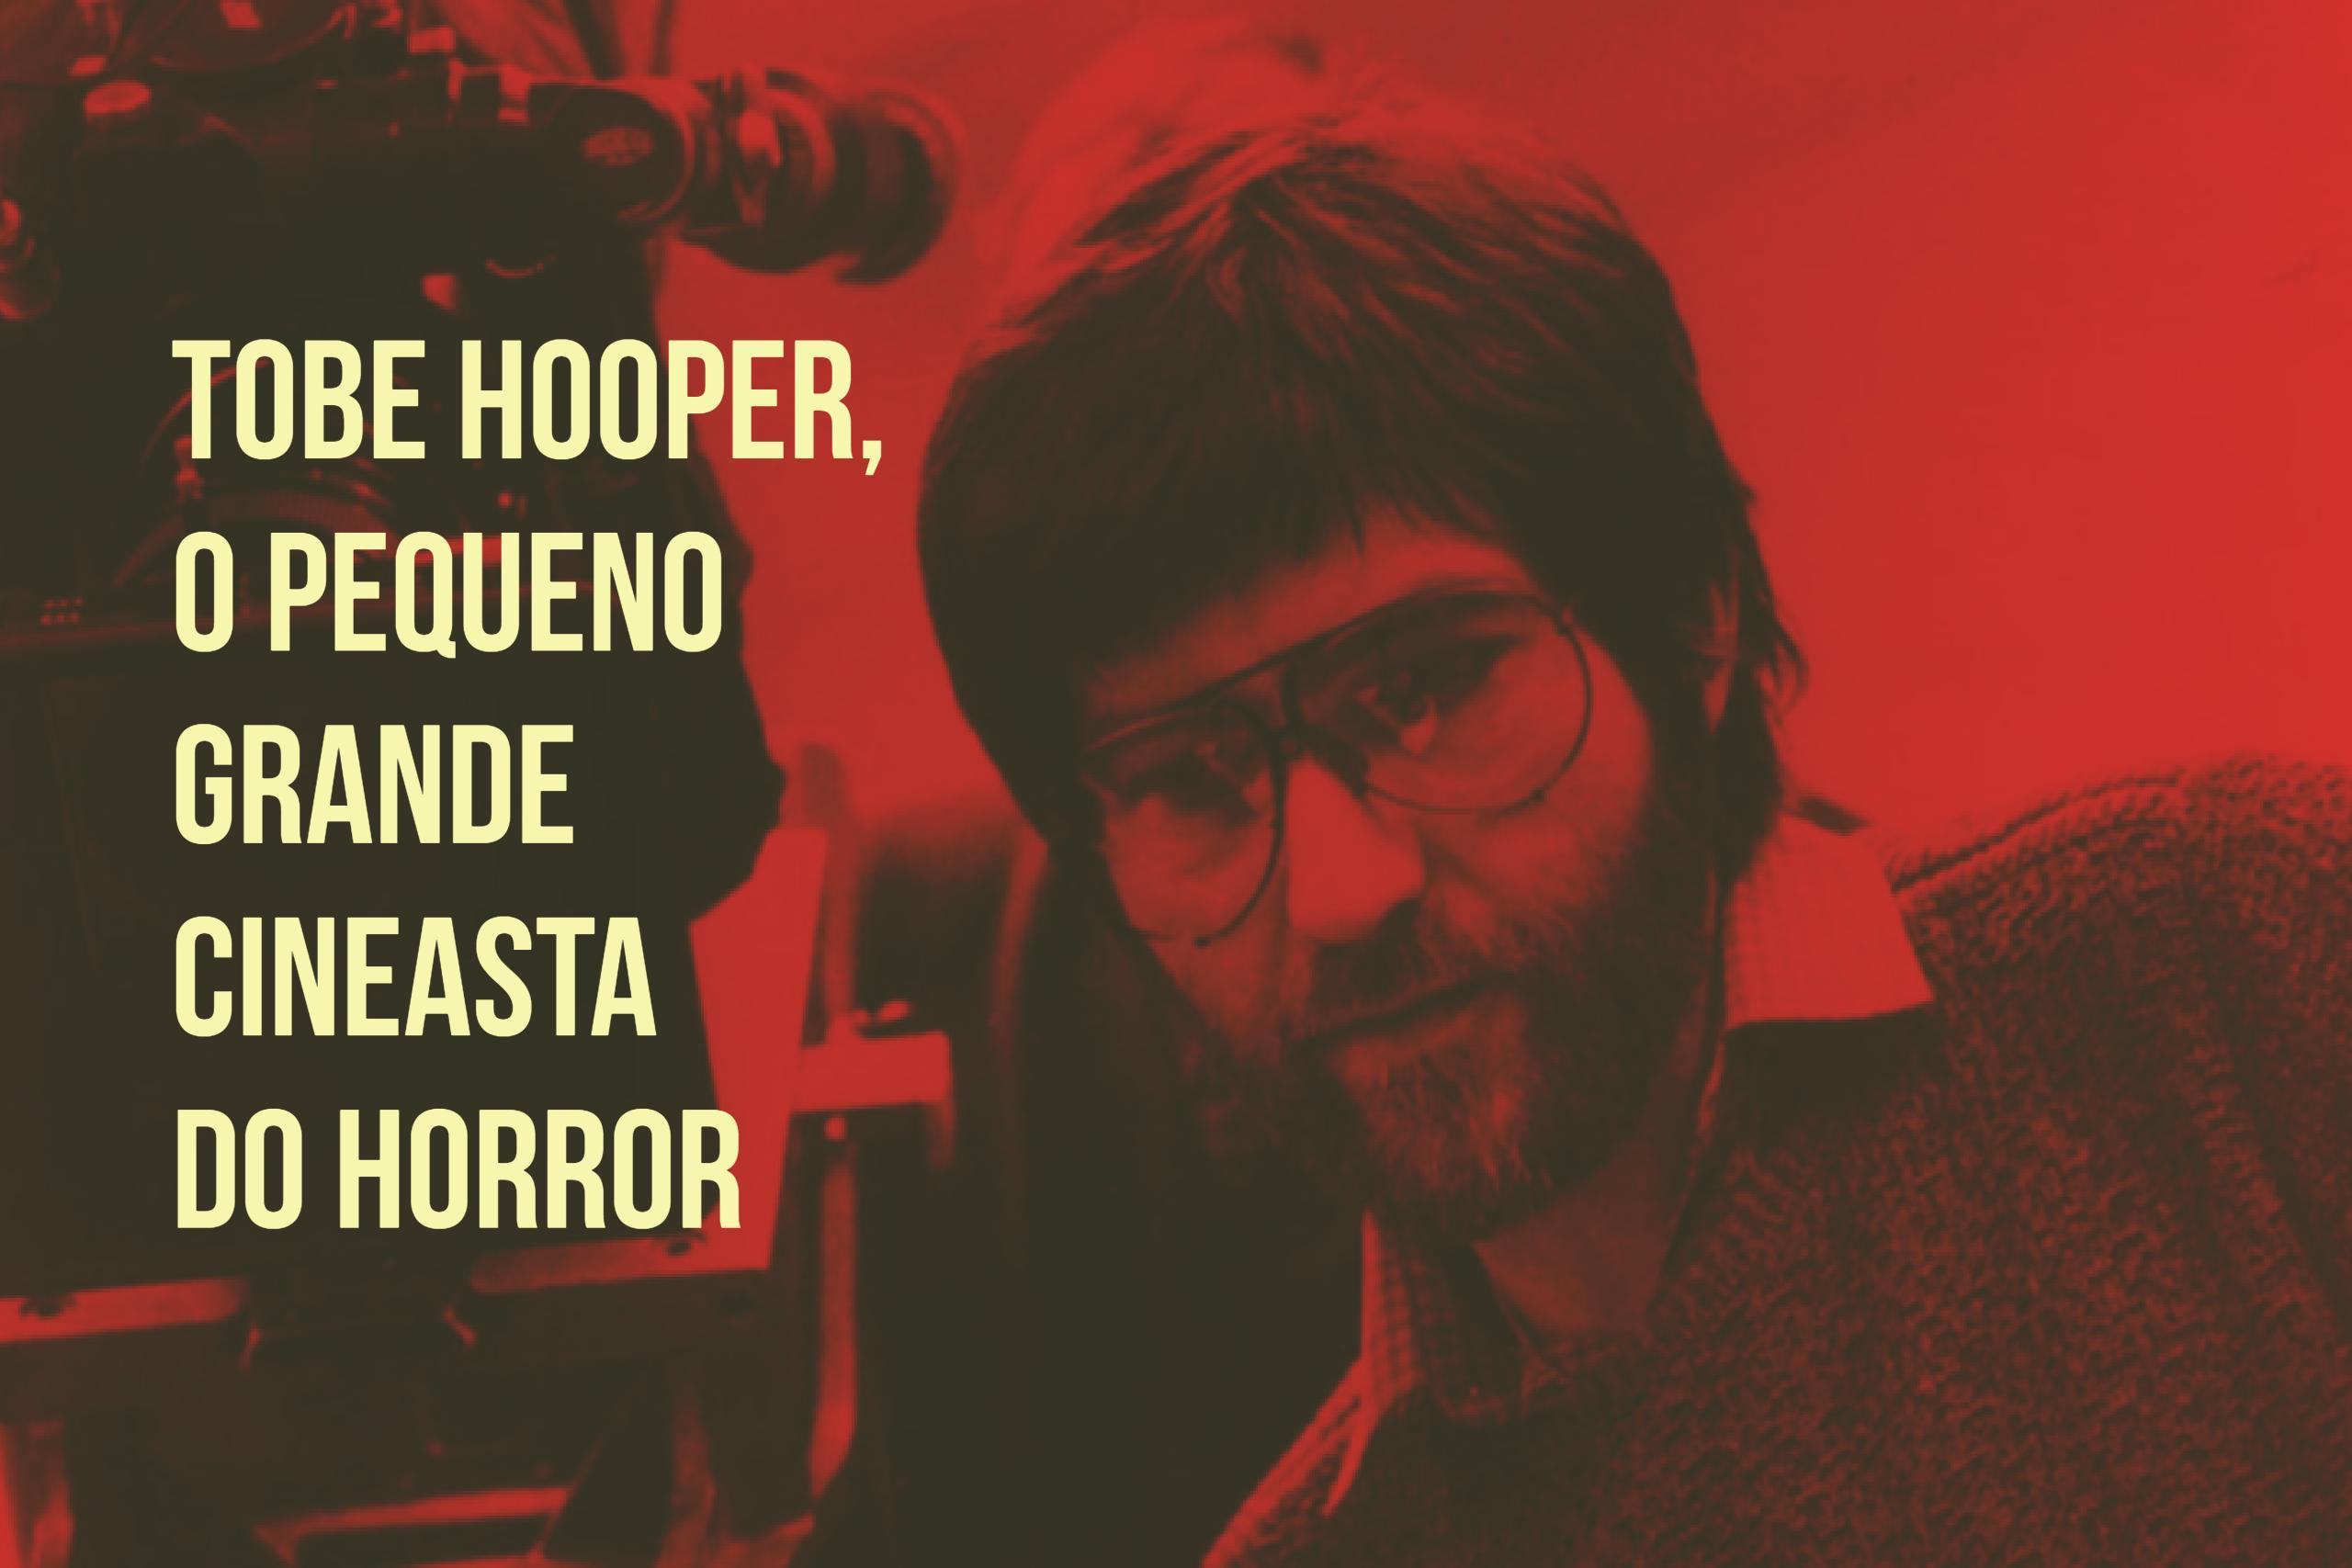 Tobe Hooper, o pequeno grande cineasta do Horror